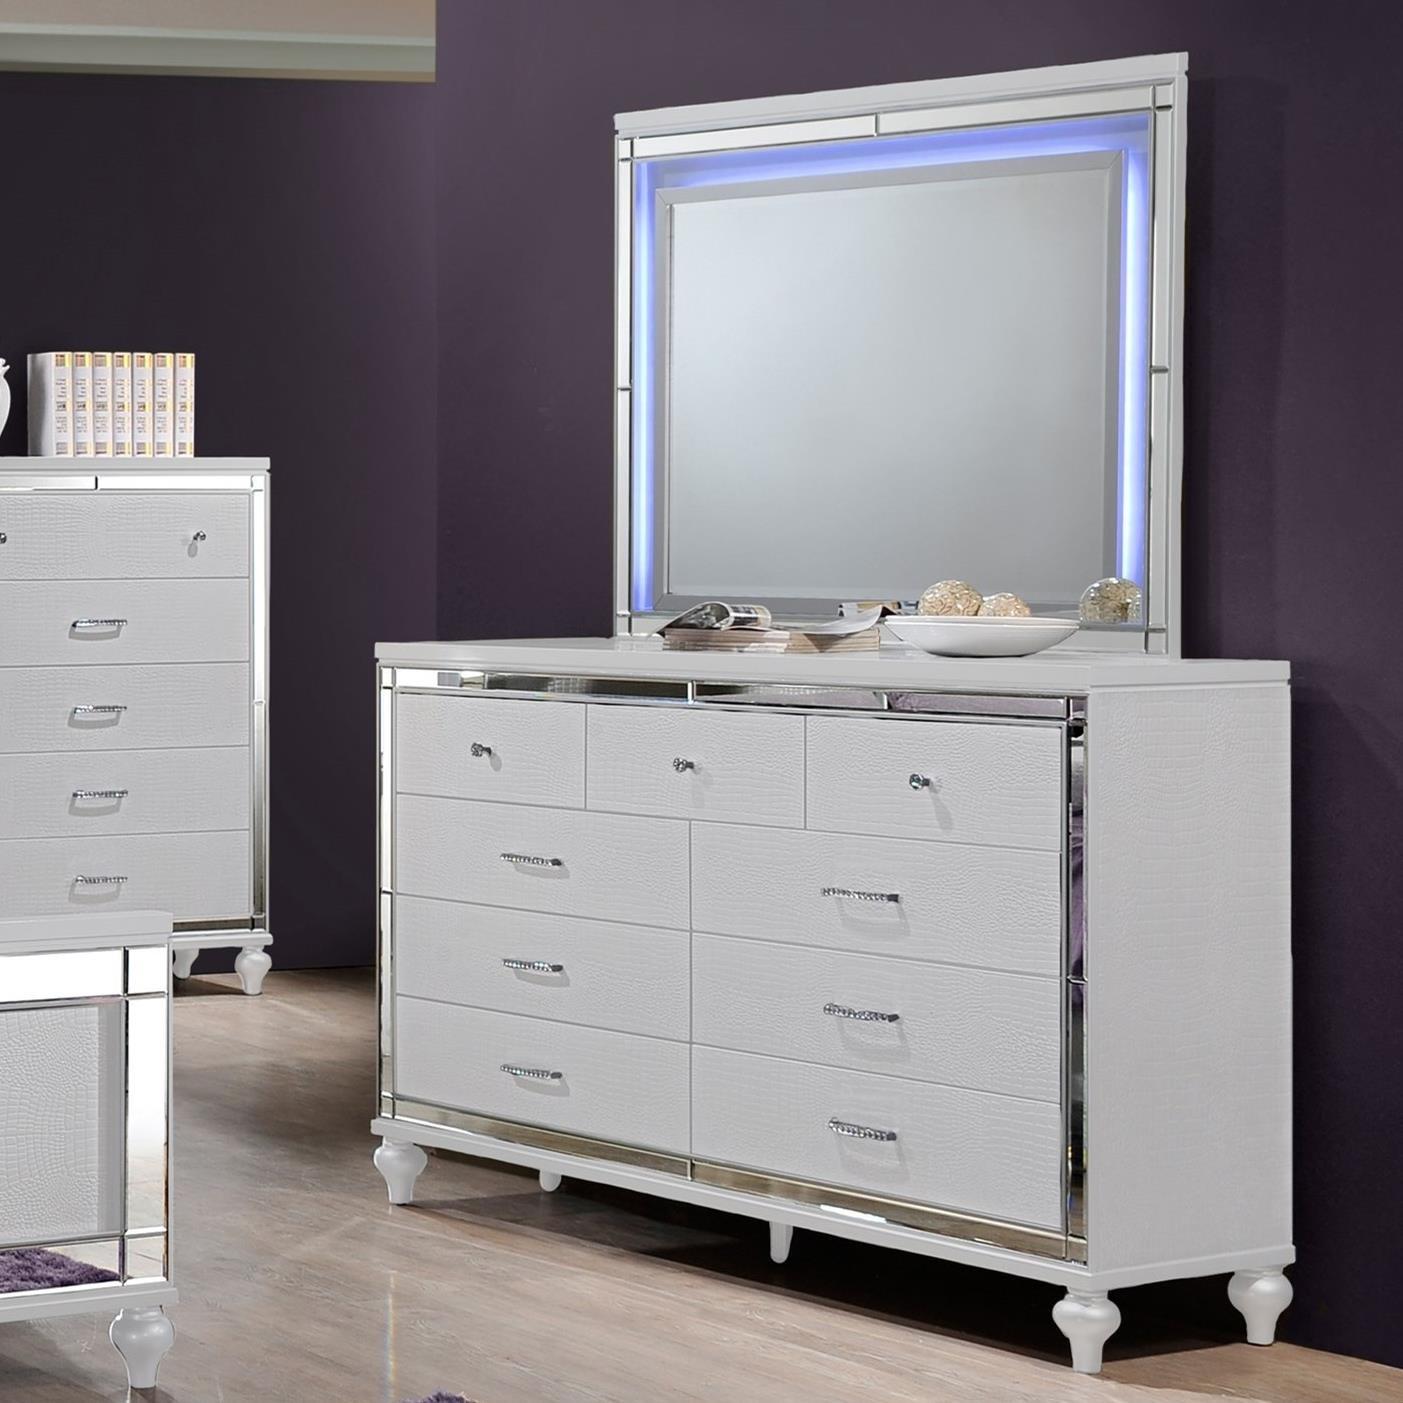 New Classic Valentino Nine Drawer Dresser And Led Backlit Mirror Wilcox Furniture Dresser Mirror Sets